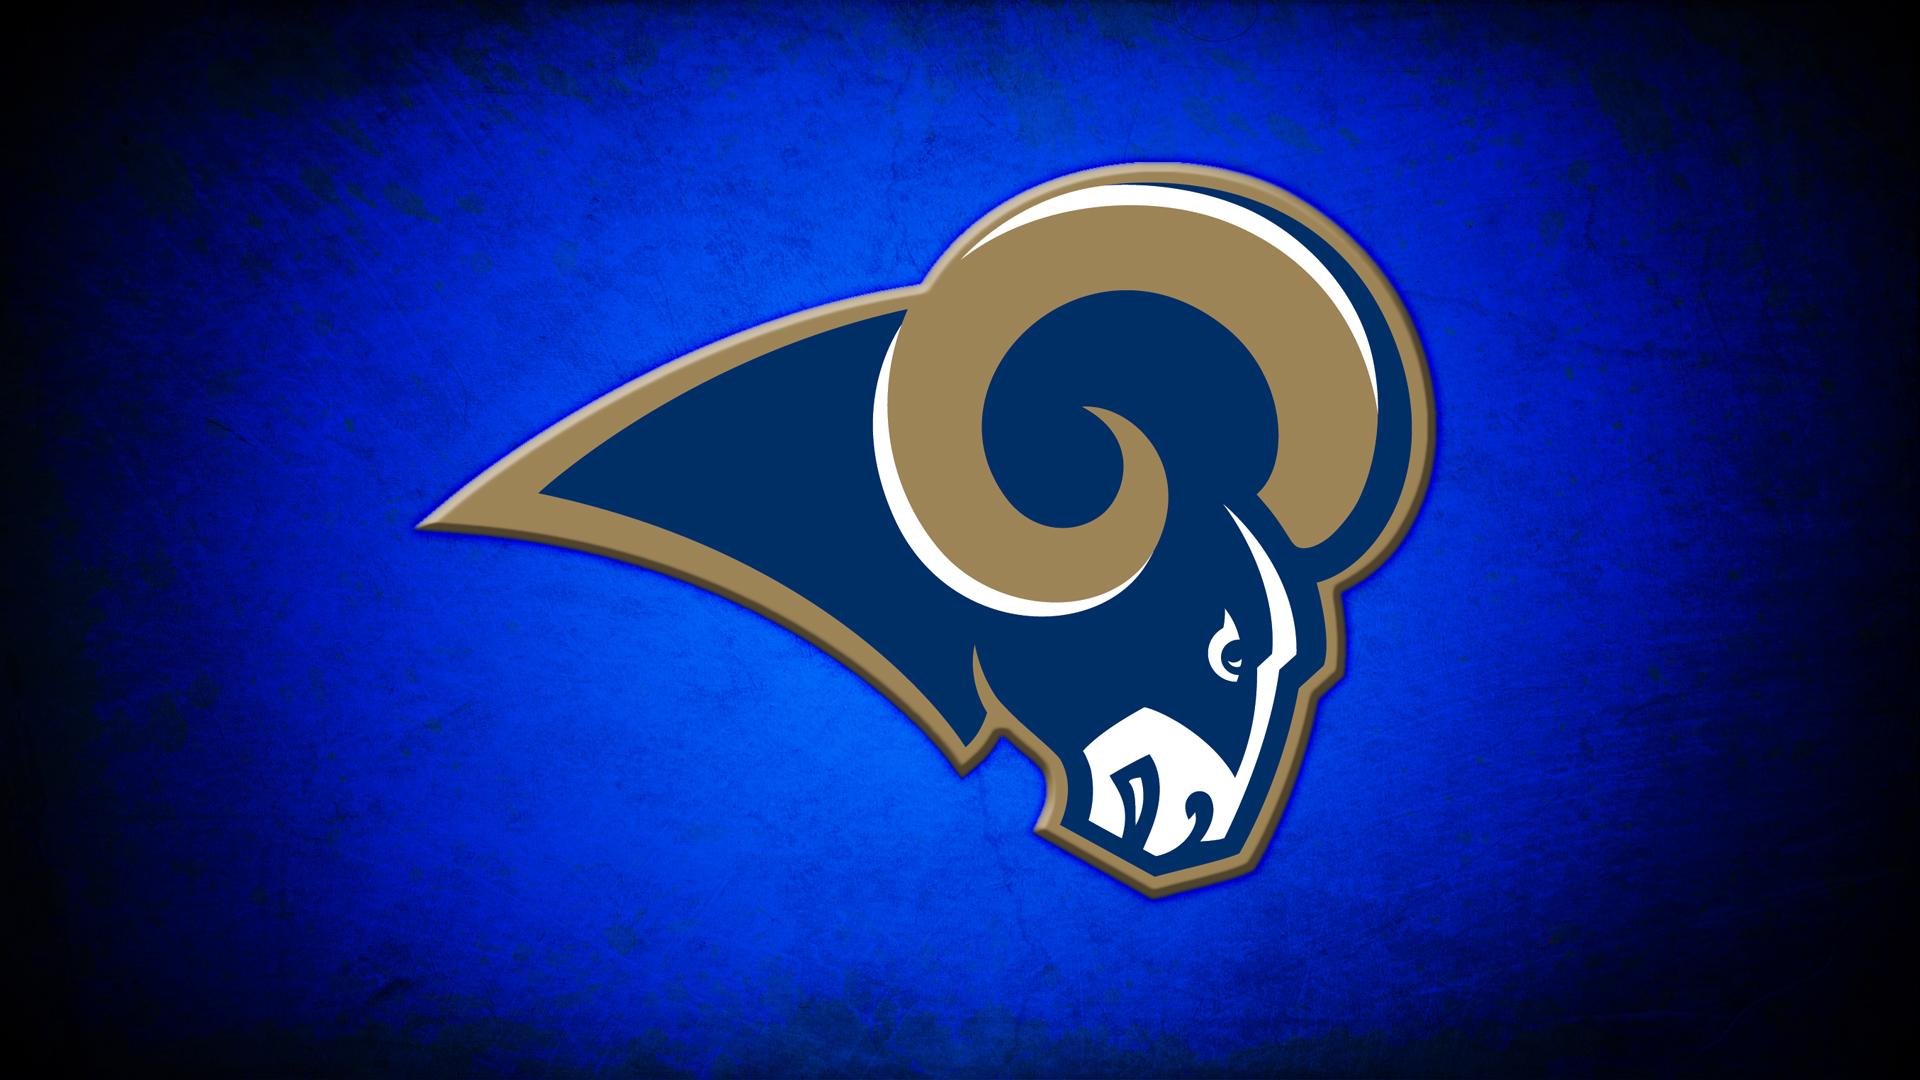 St. Louis Rams HD images